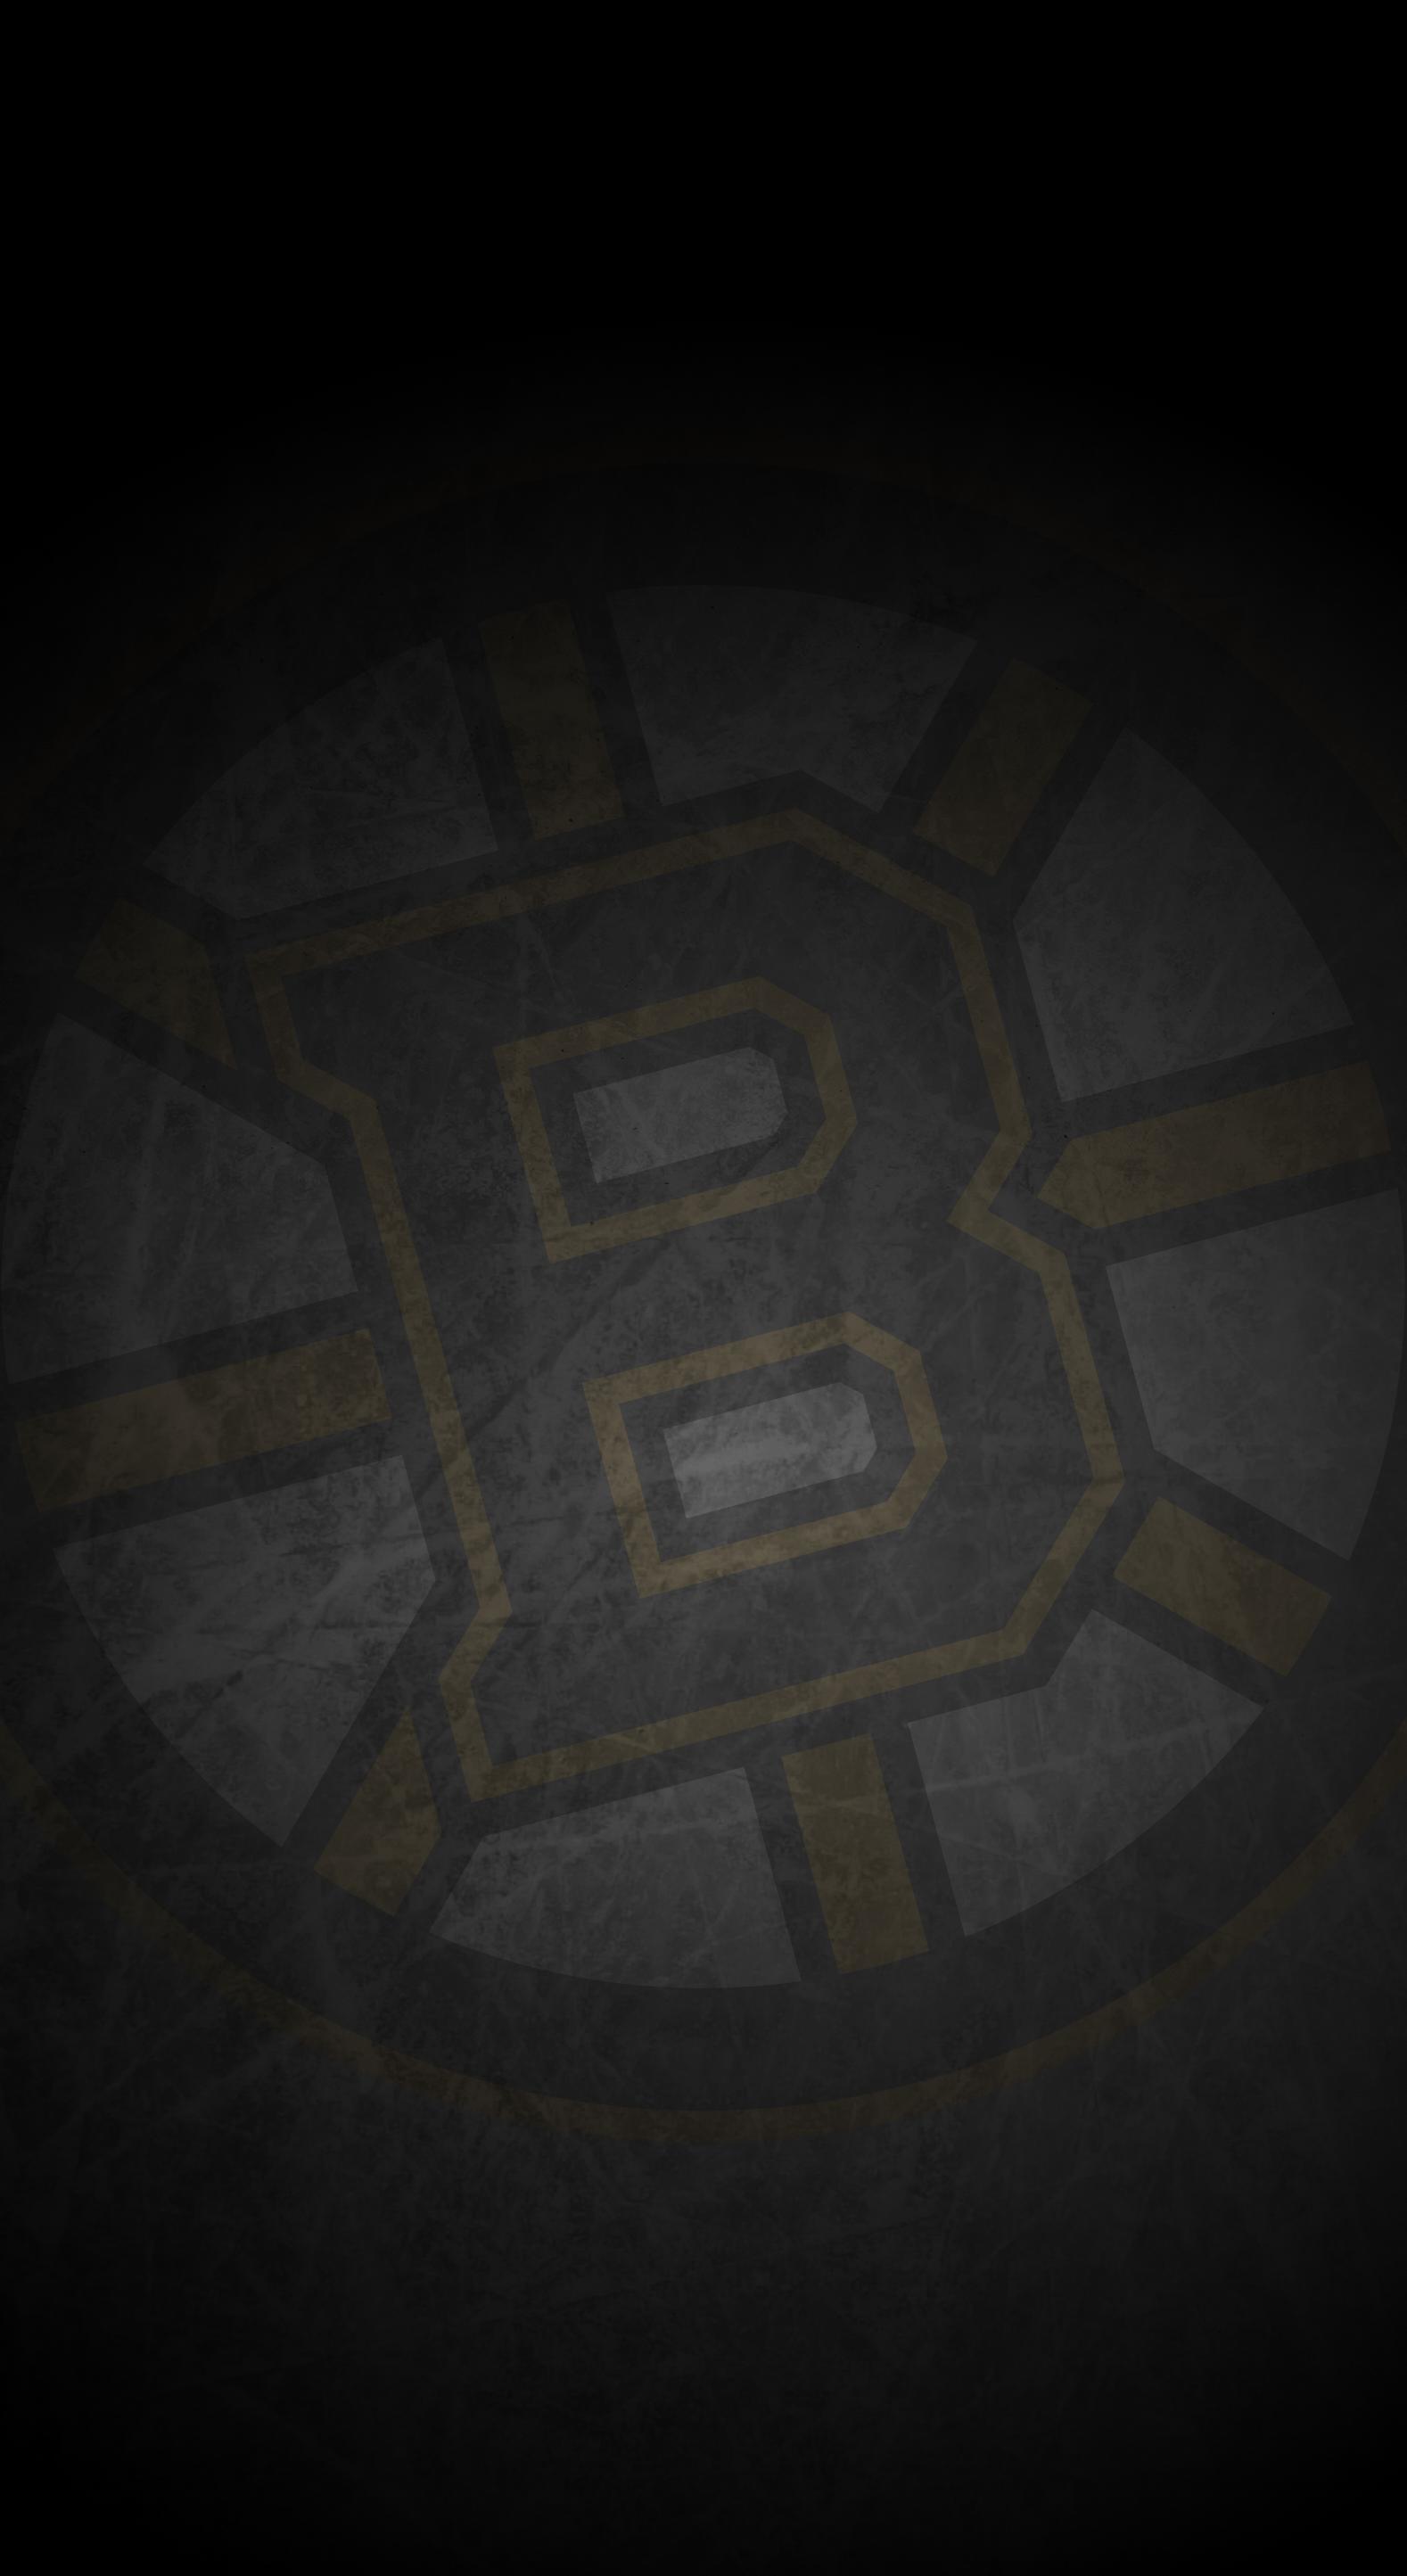 Boston Bruins Nhl Iphone X Xs Xr Home Screen Wallpaper Nhl Wallpaper Boston Bruins Boston Bruins Wallpaper